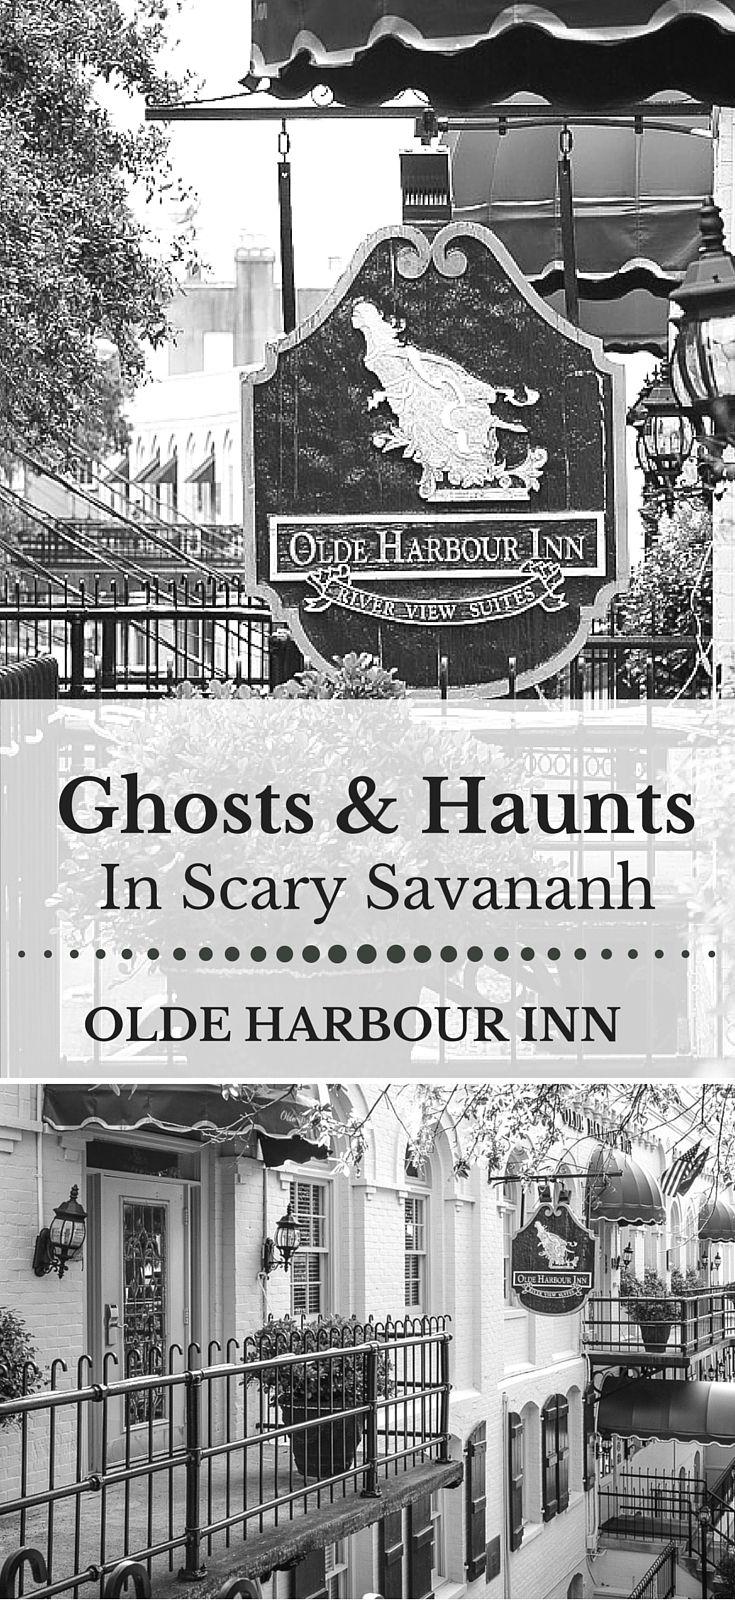 Haunted Hotels In Savannah Ga Ghost Tours